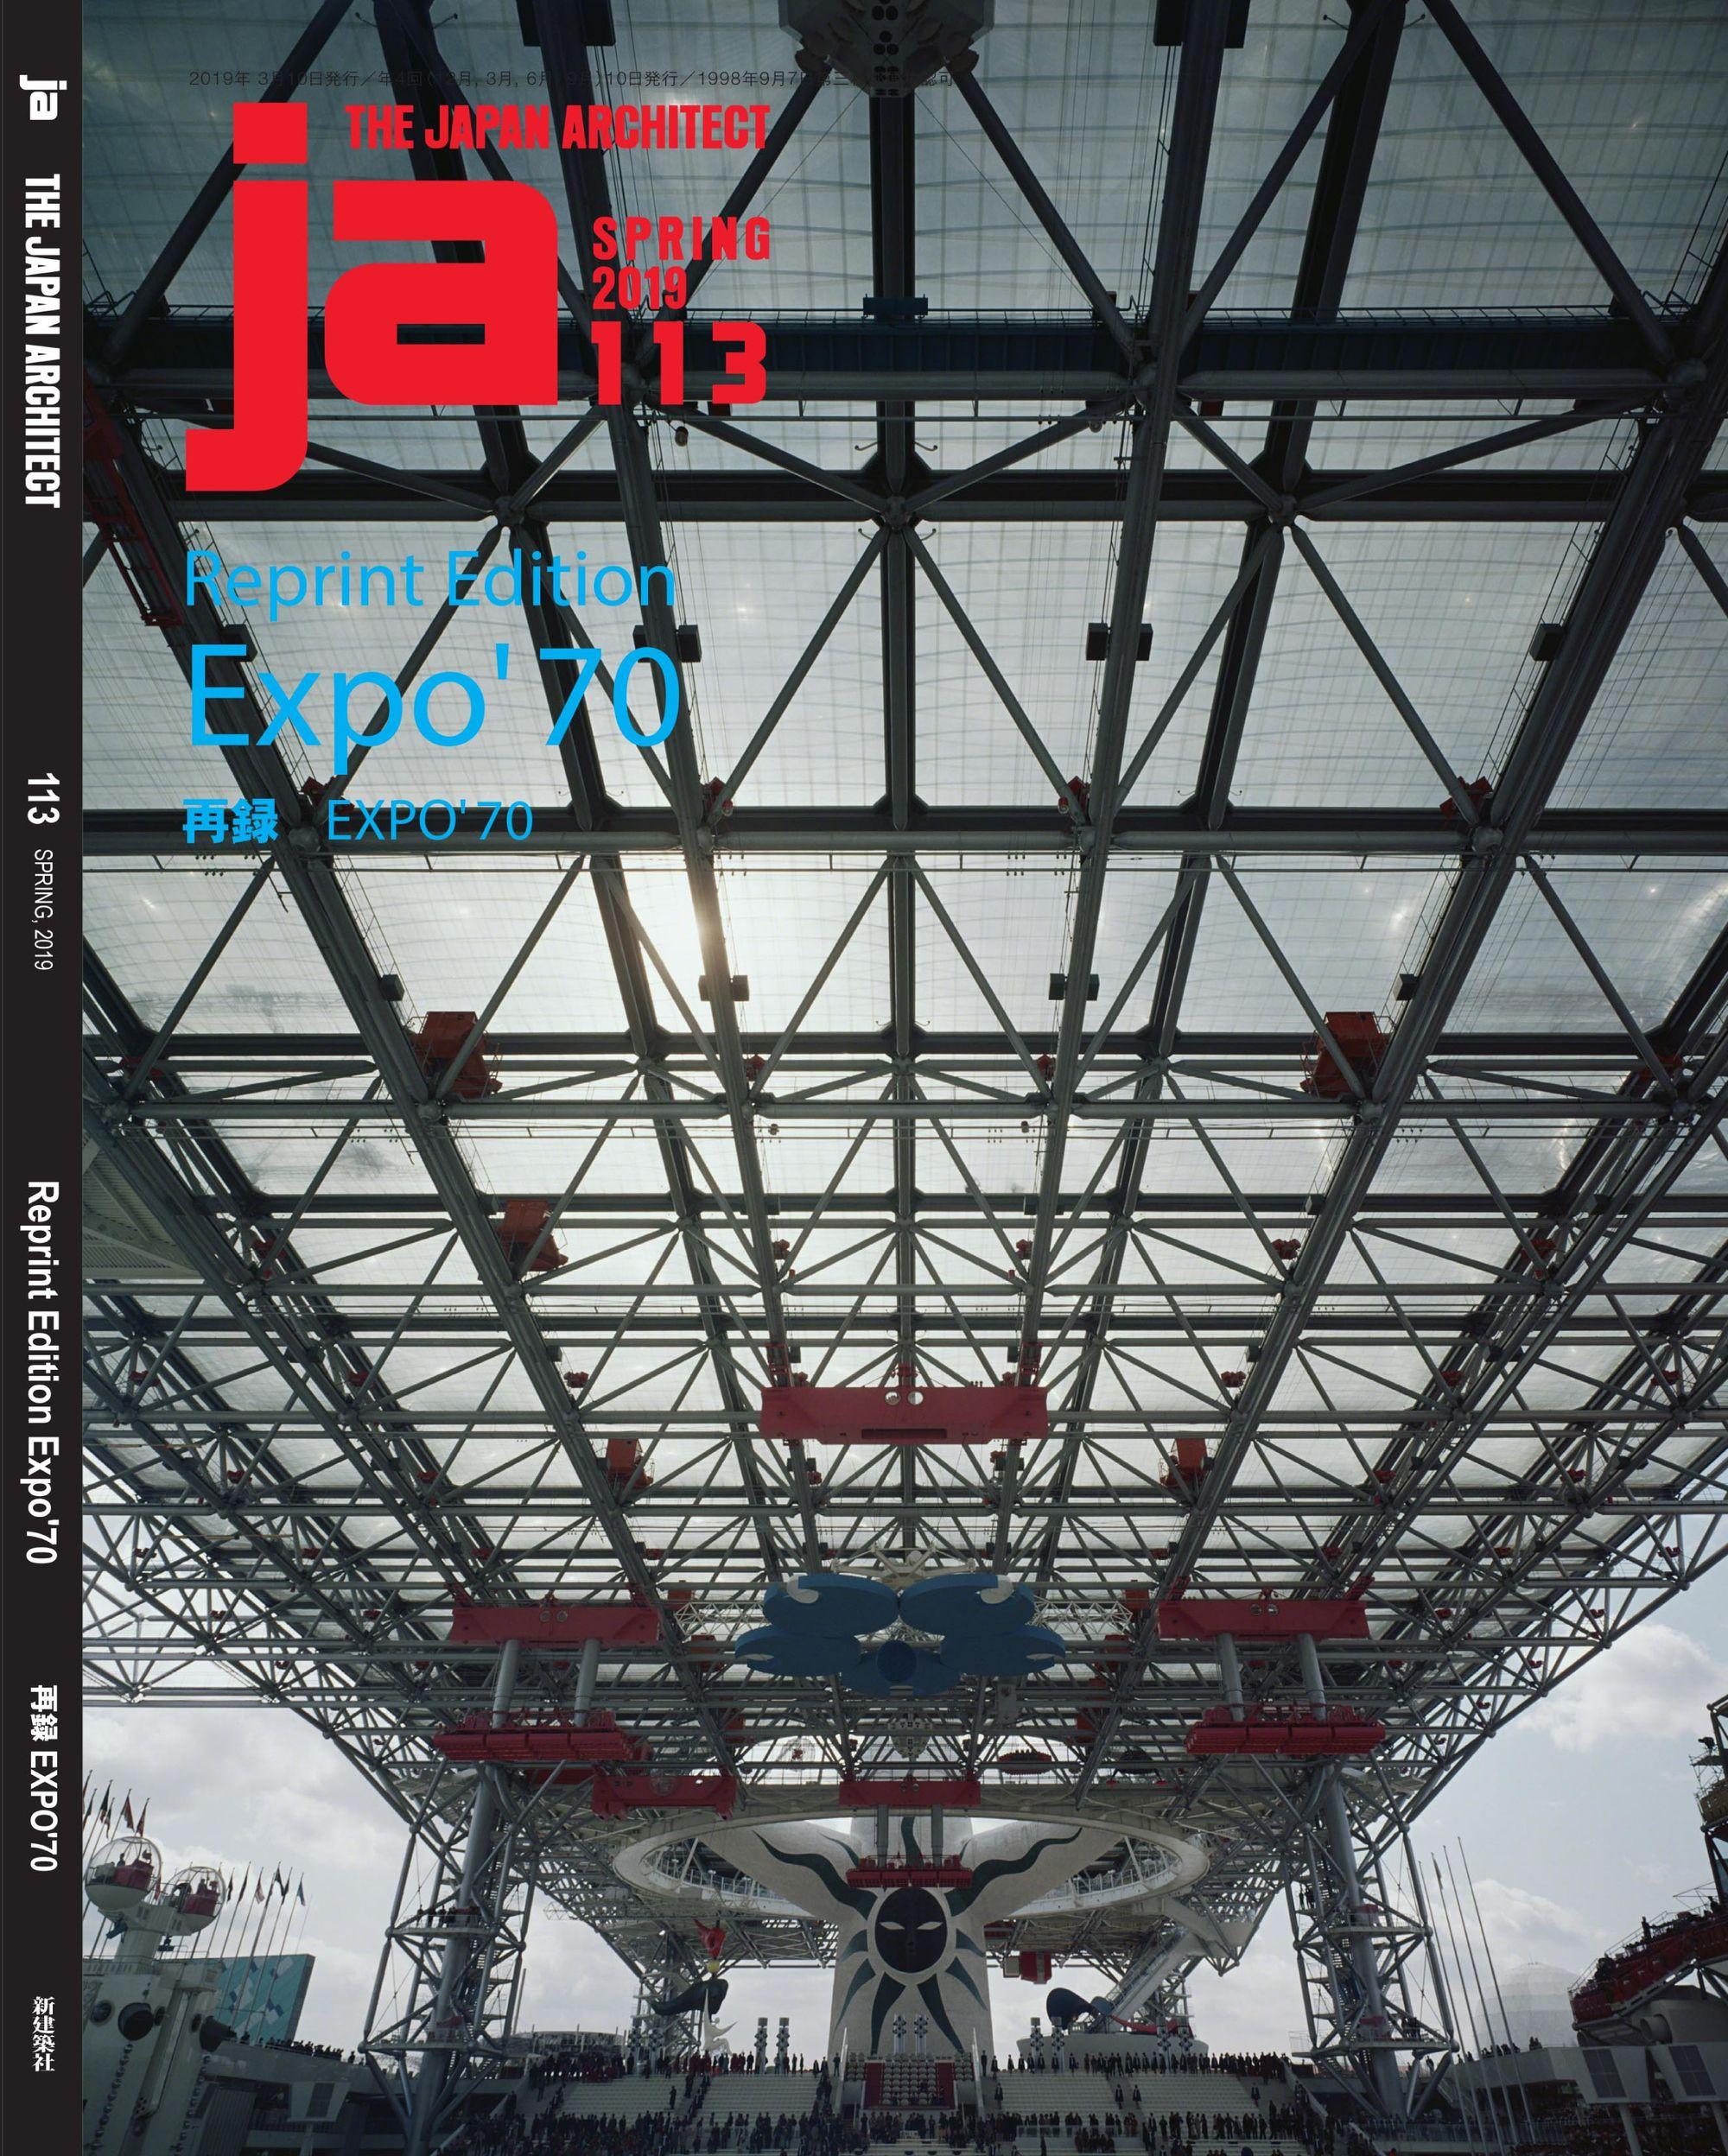 Ja 113 Expo 70 Japanese Architect Expo Space Frame